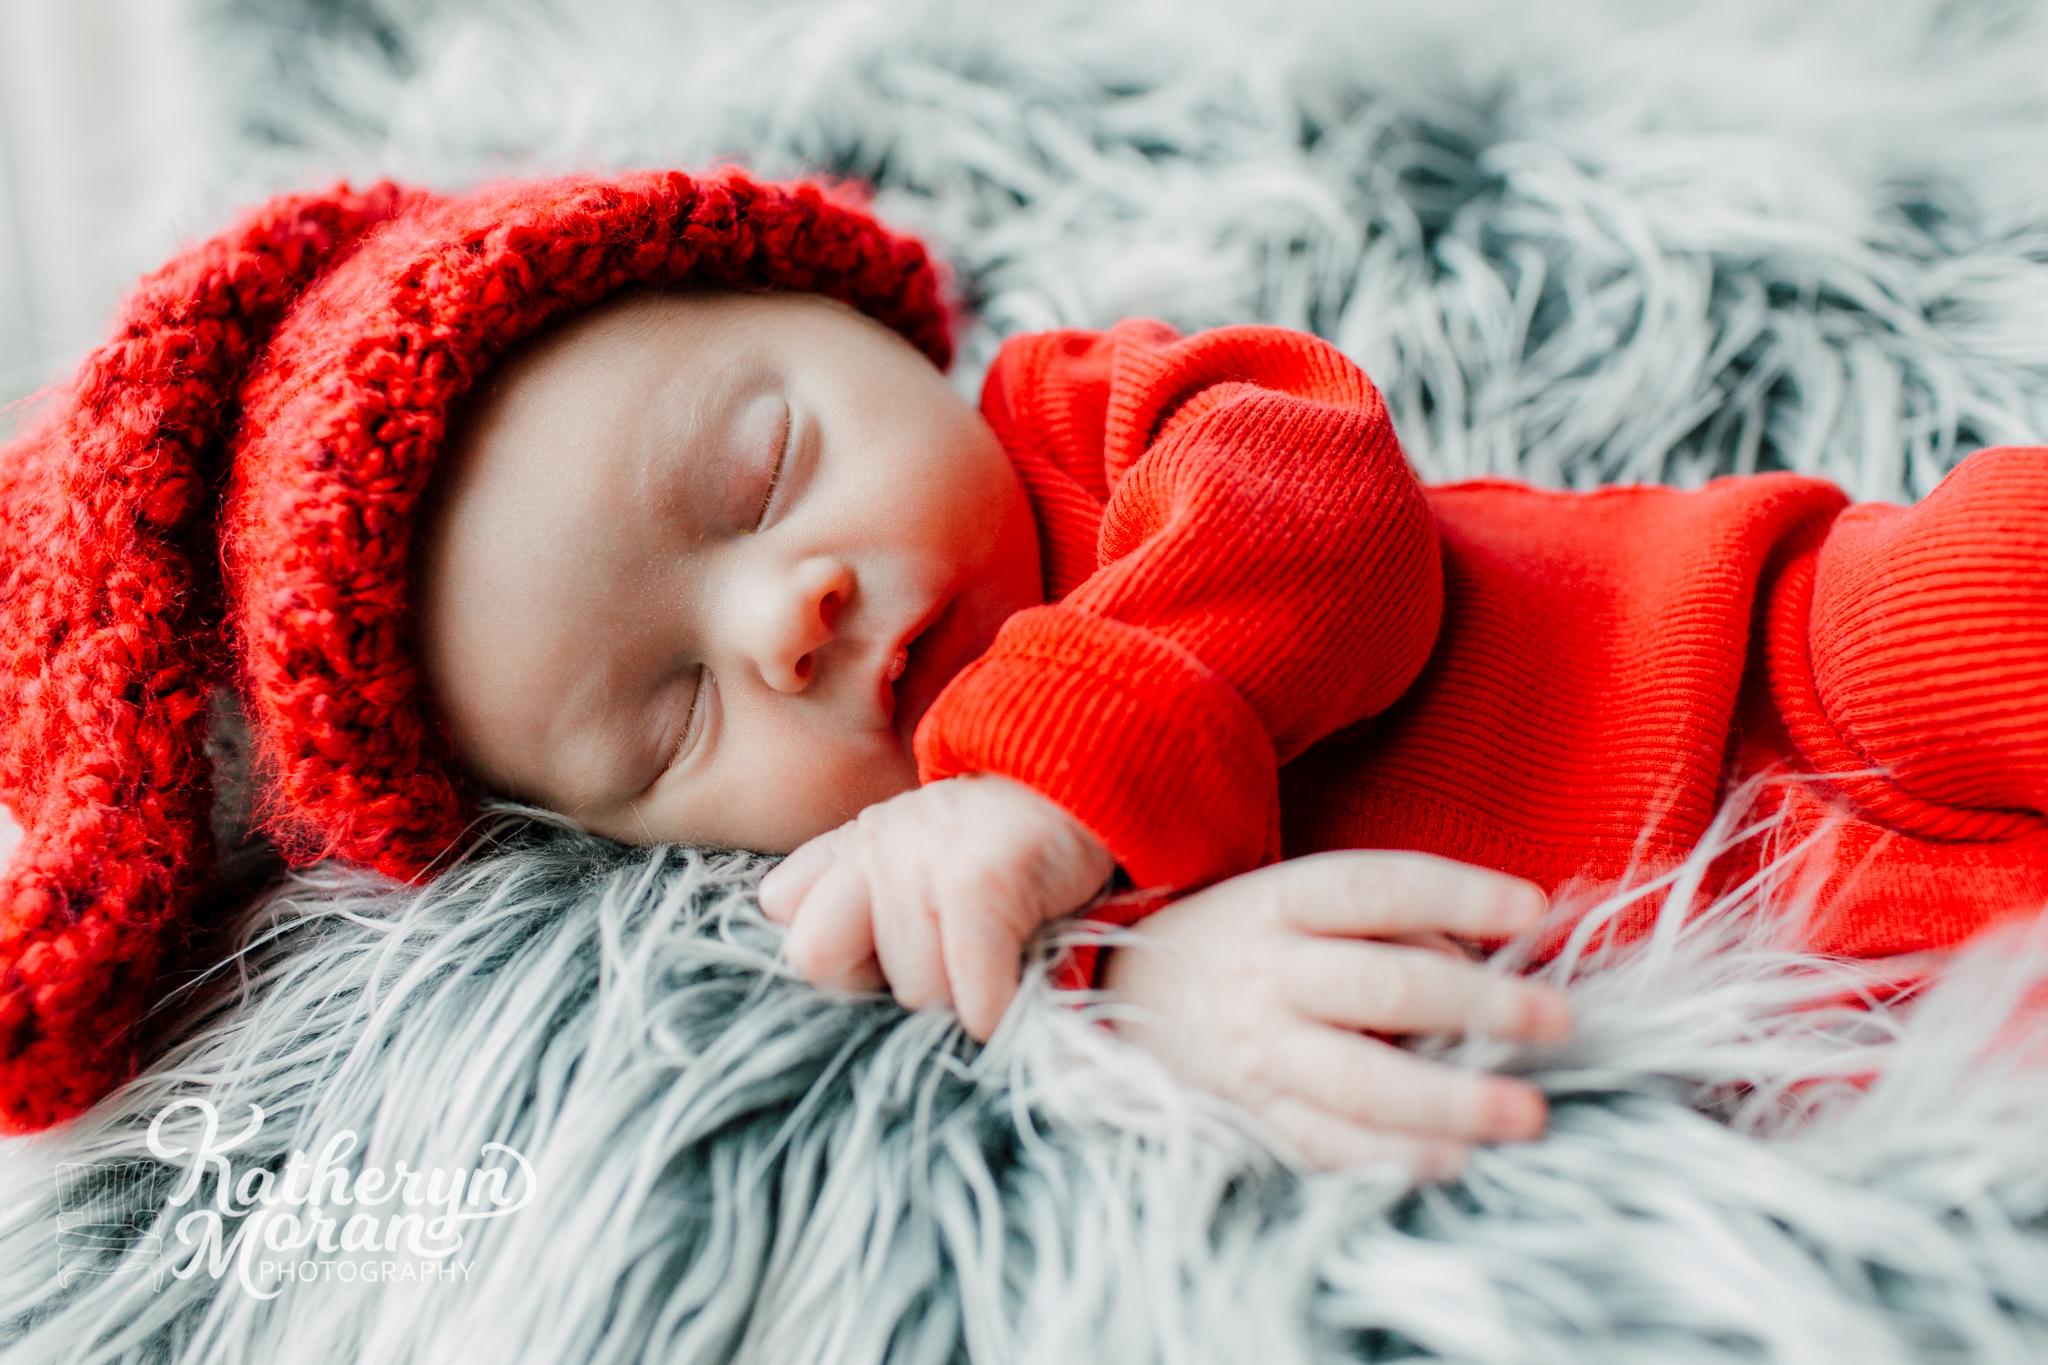 bellingham-newborn-lifestyle-photographer-katheryn-moran-harrison-hill-16.jpg